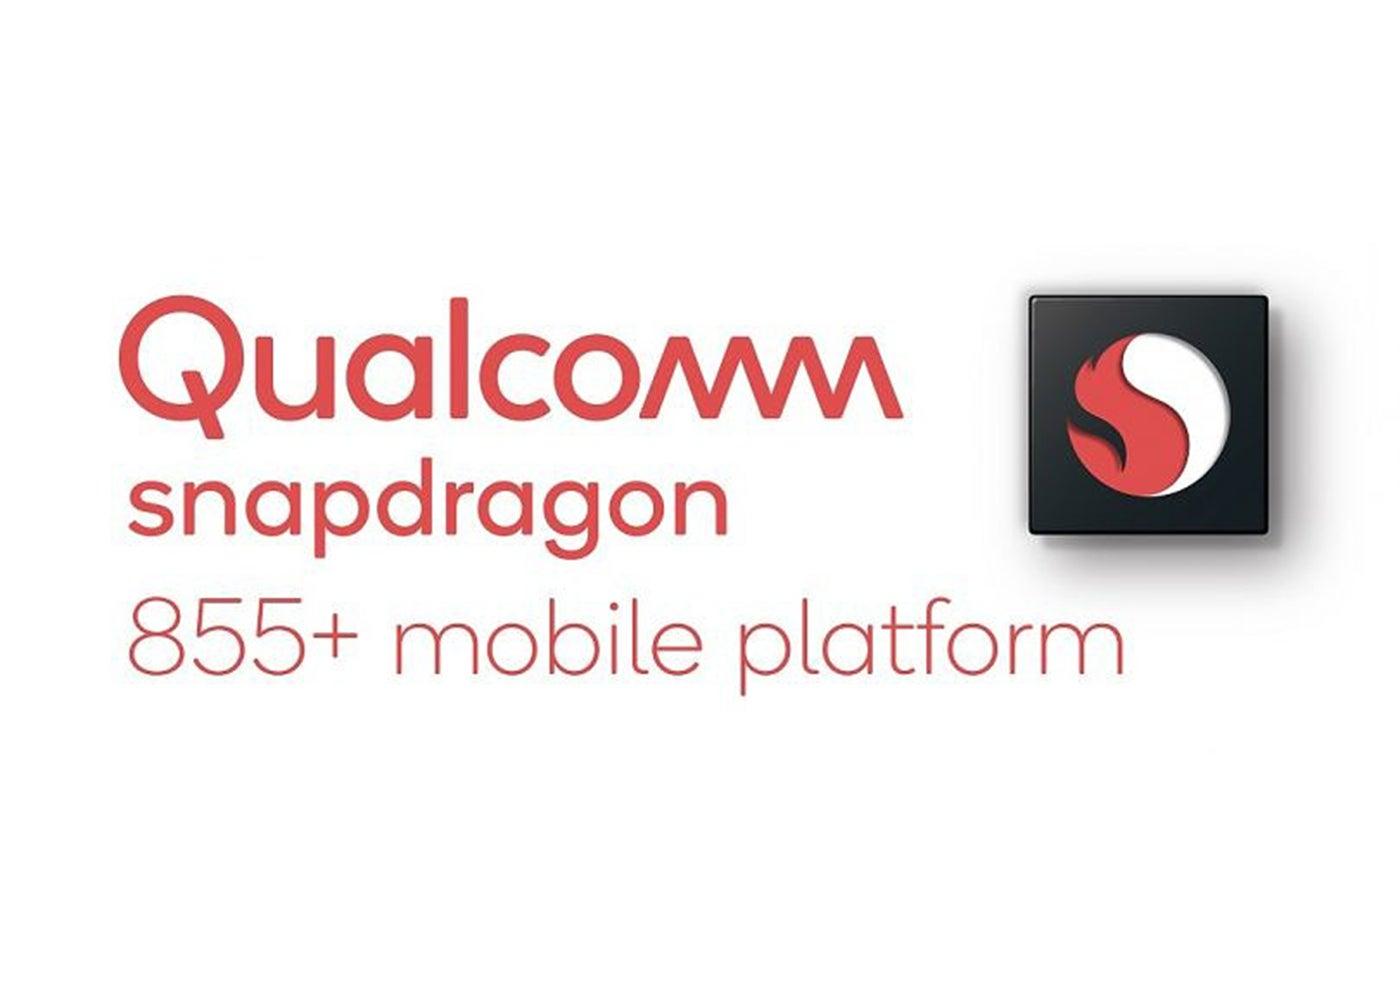 Xiaomi confirma que lanzará un teléfono Redmi con Snapdragon 855+